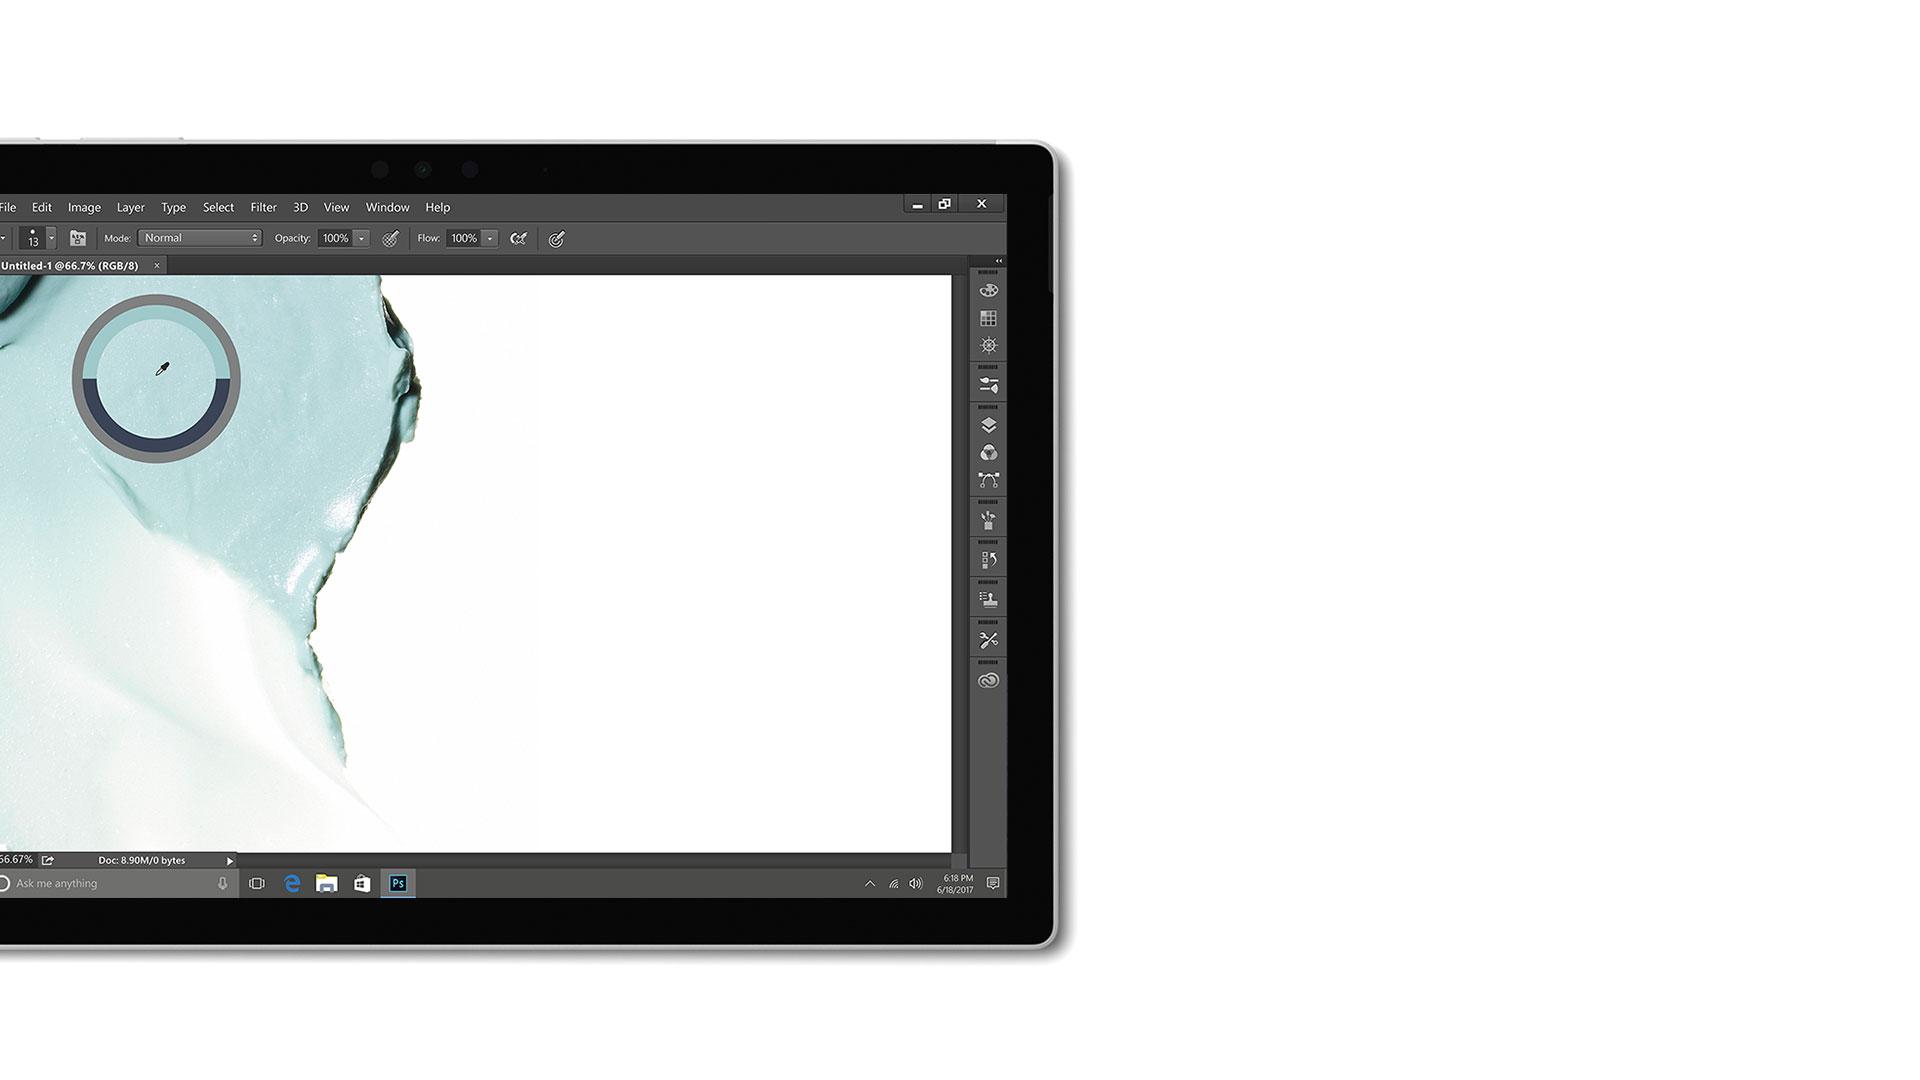 Image de l'interface utilisateur d'Adobe Creative Cloud